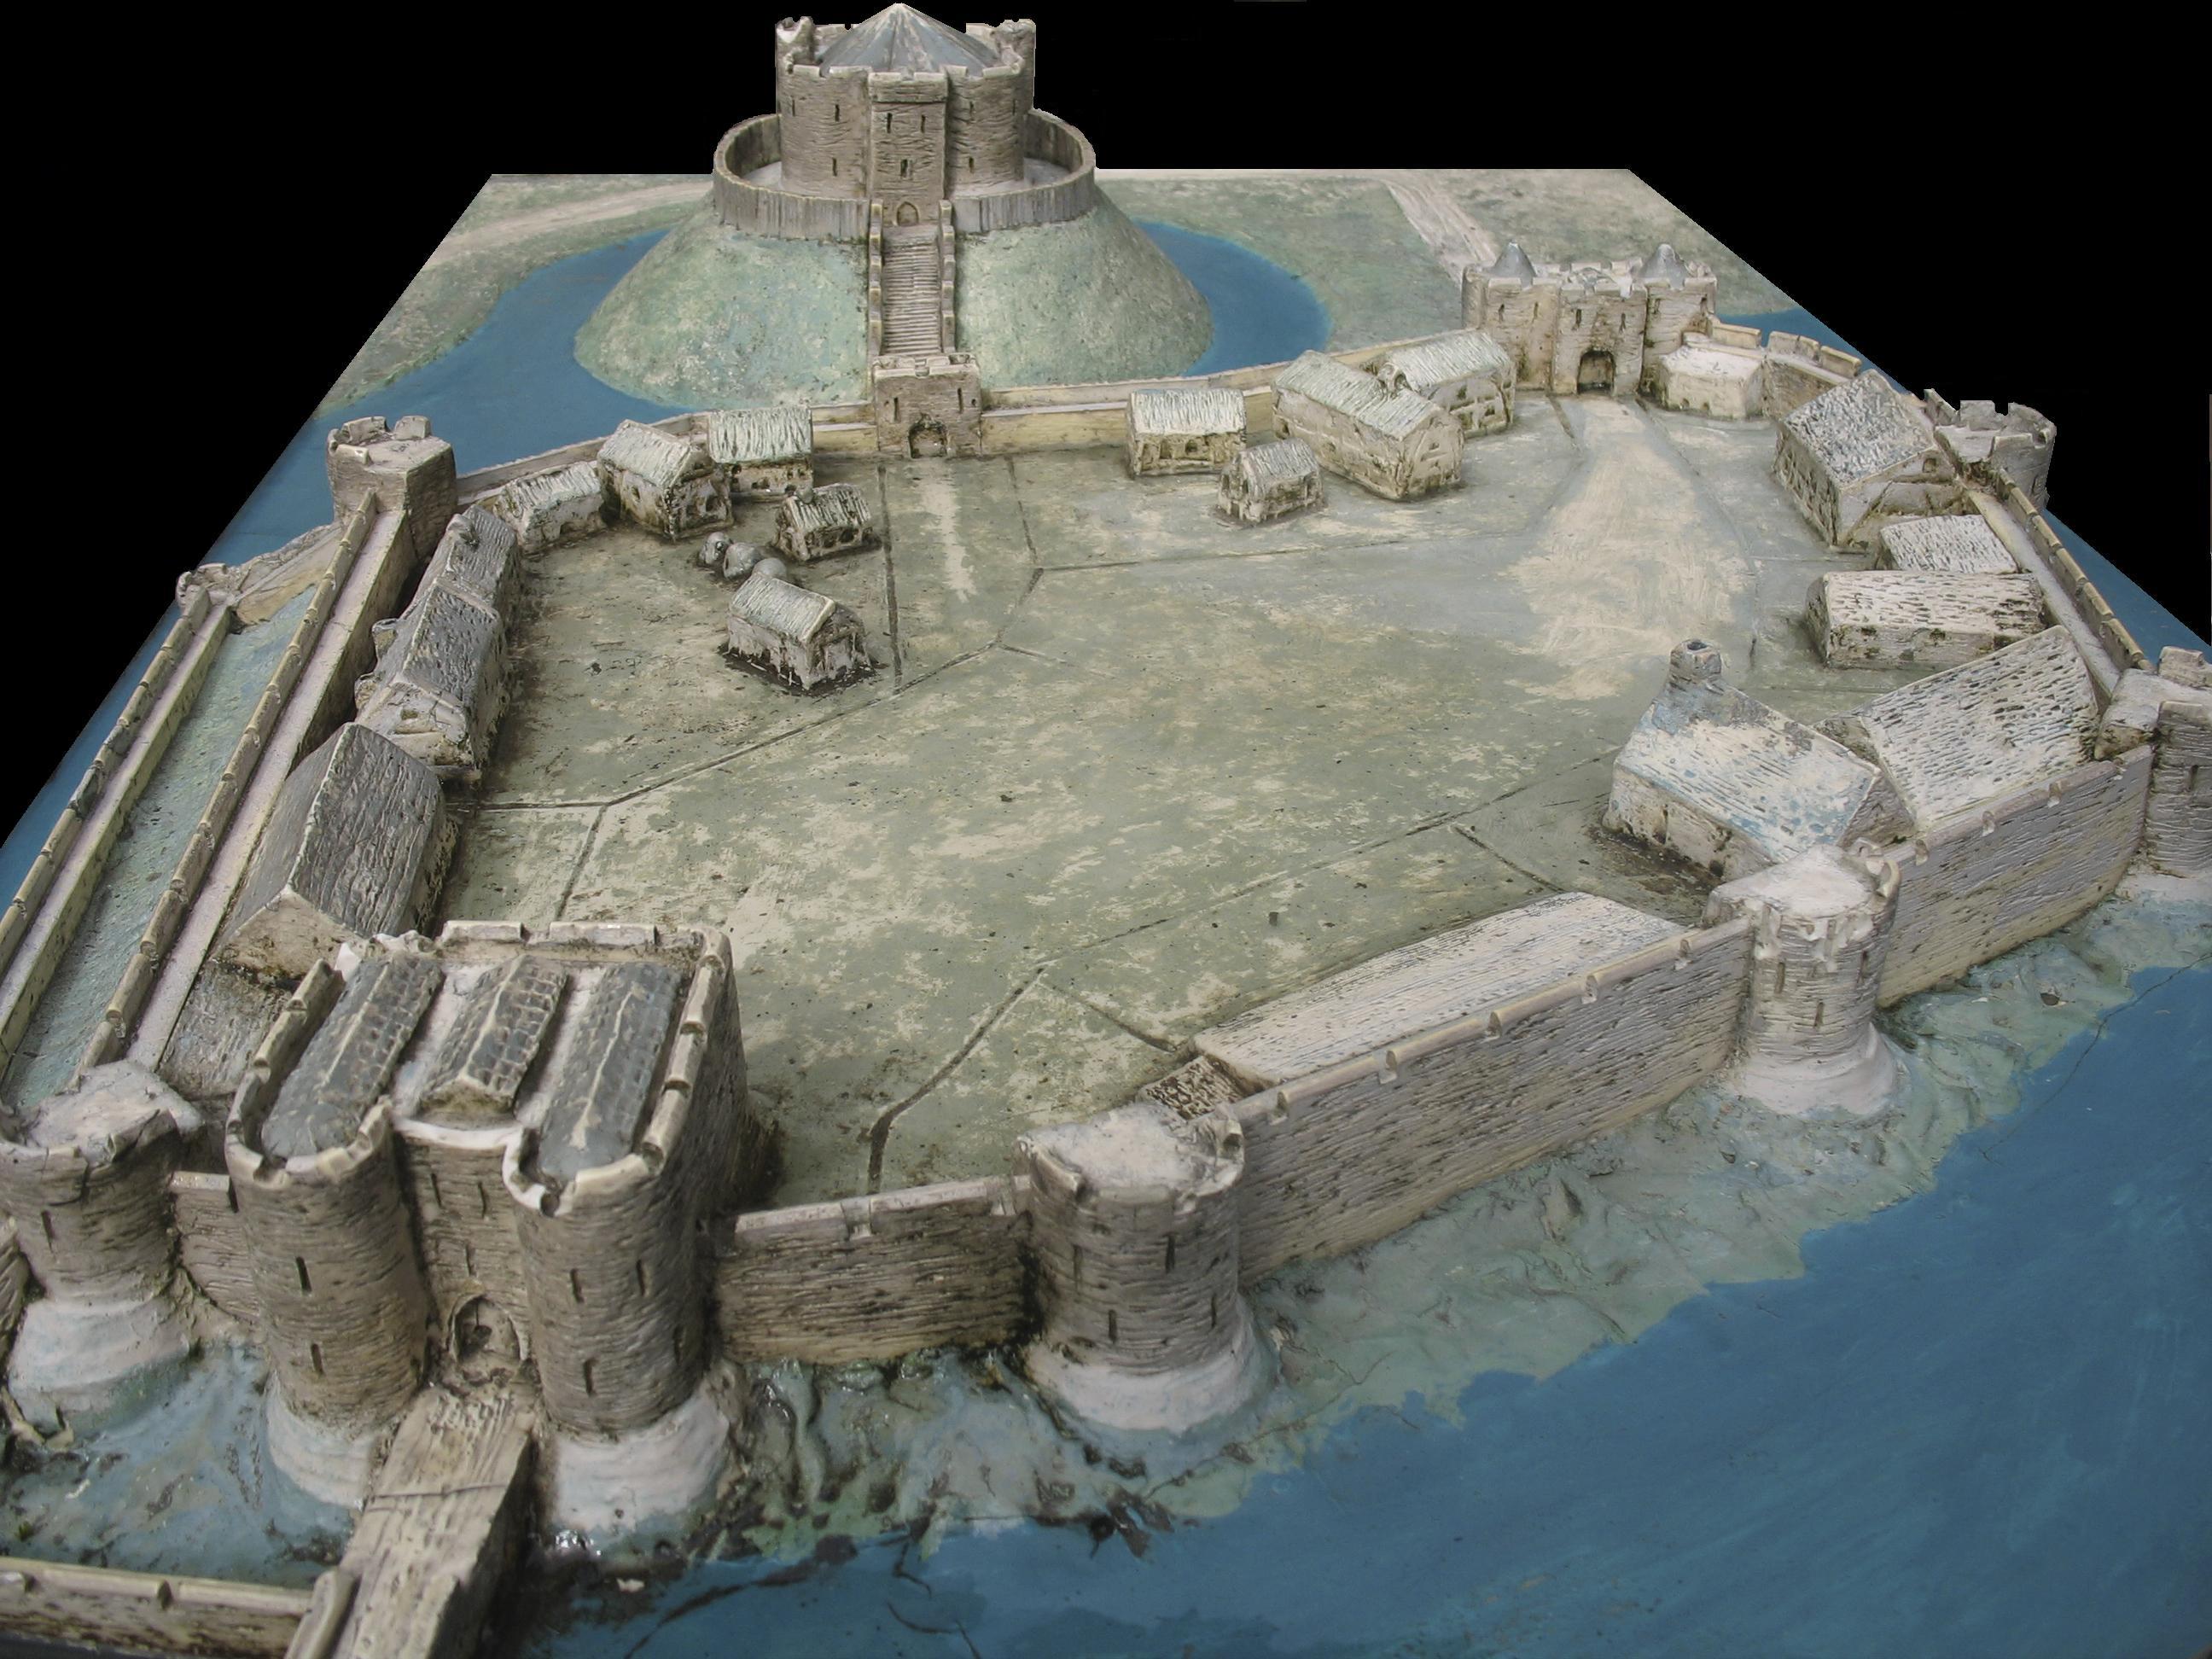 FileYork Castle DioramaJPG Wikimedia Commons